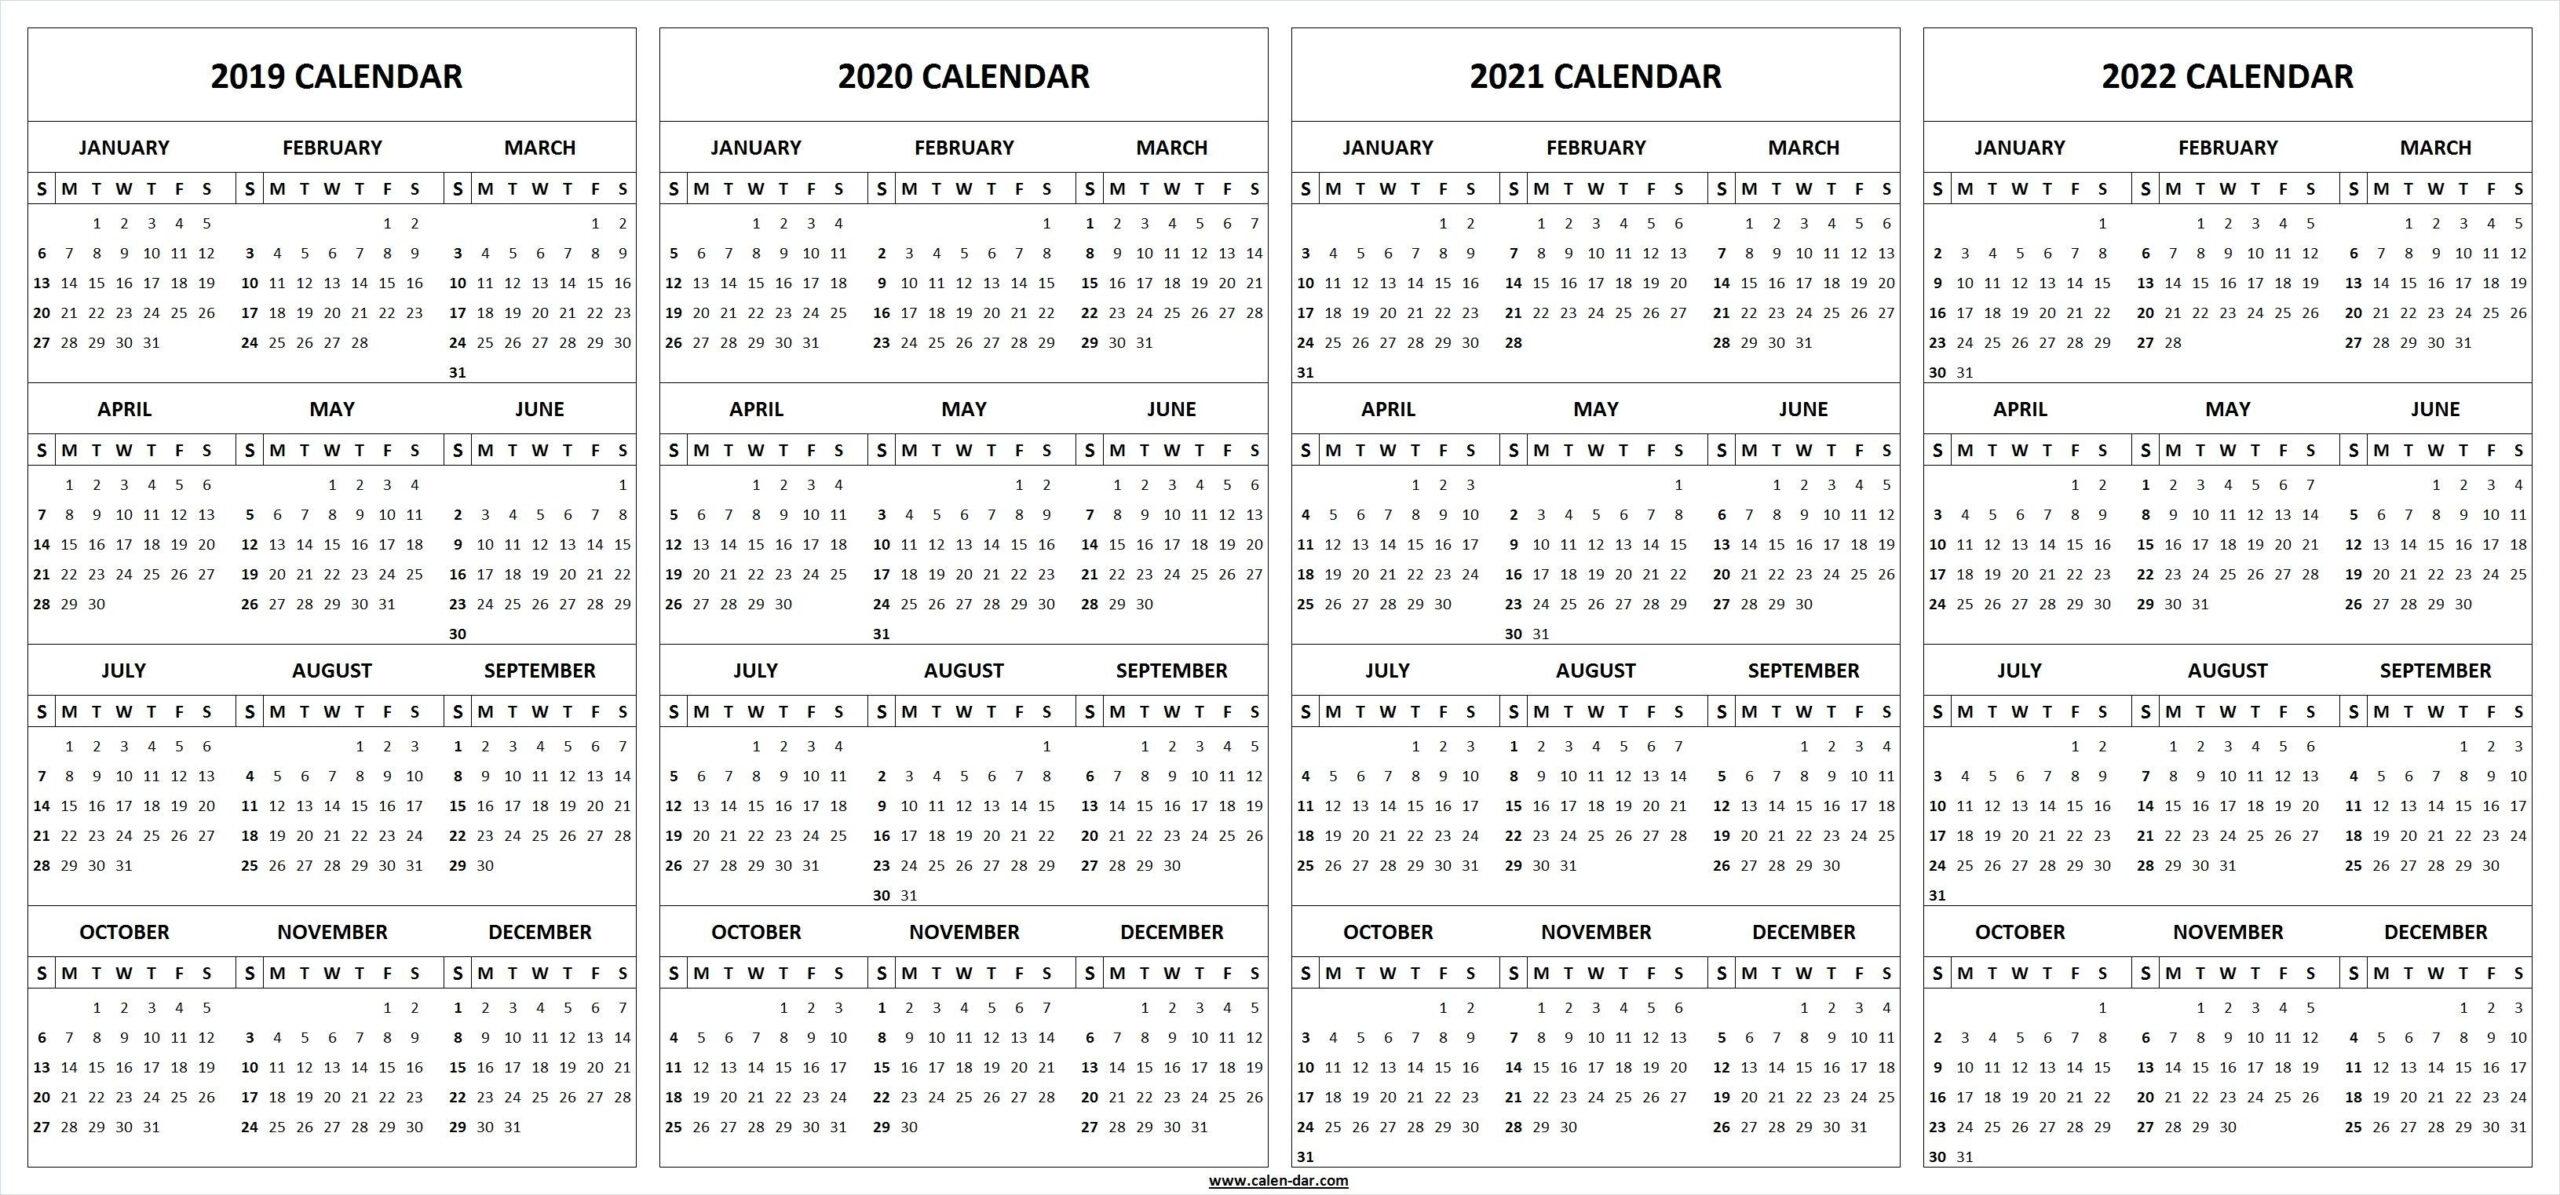 25+ Golden Marketing Calendar Templates For Excel And Google